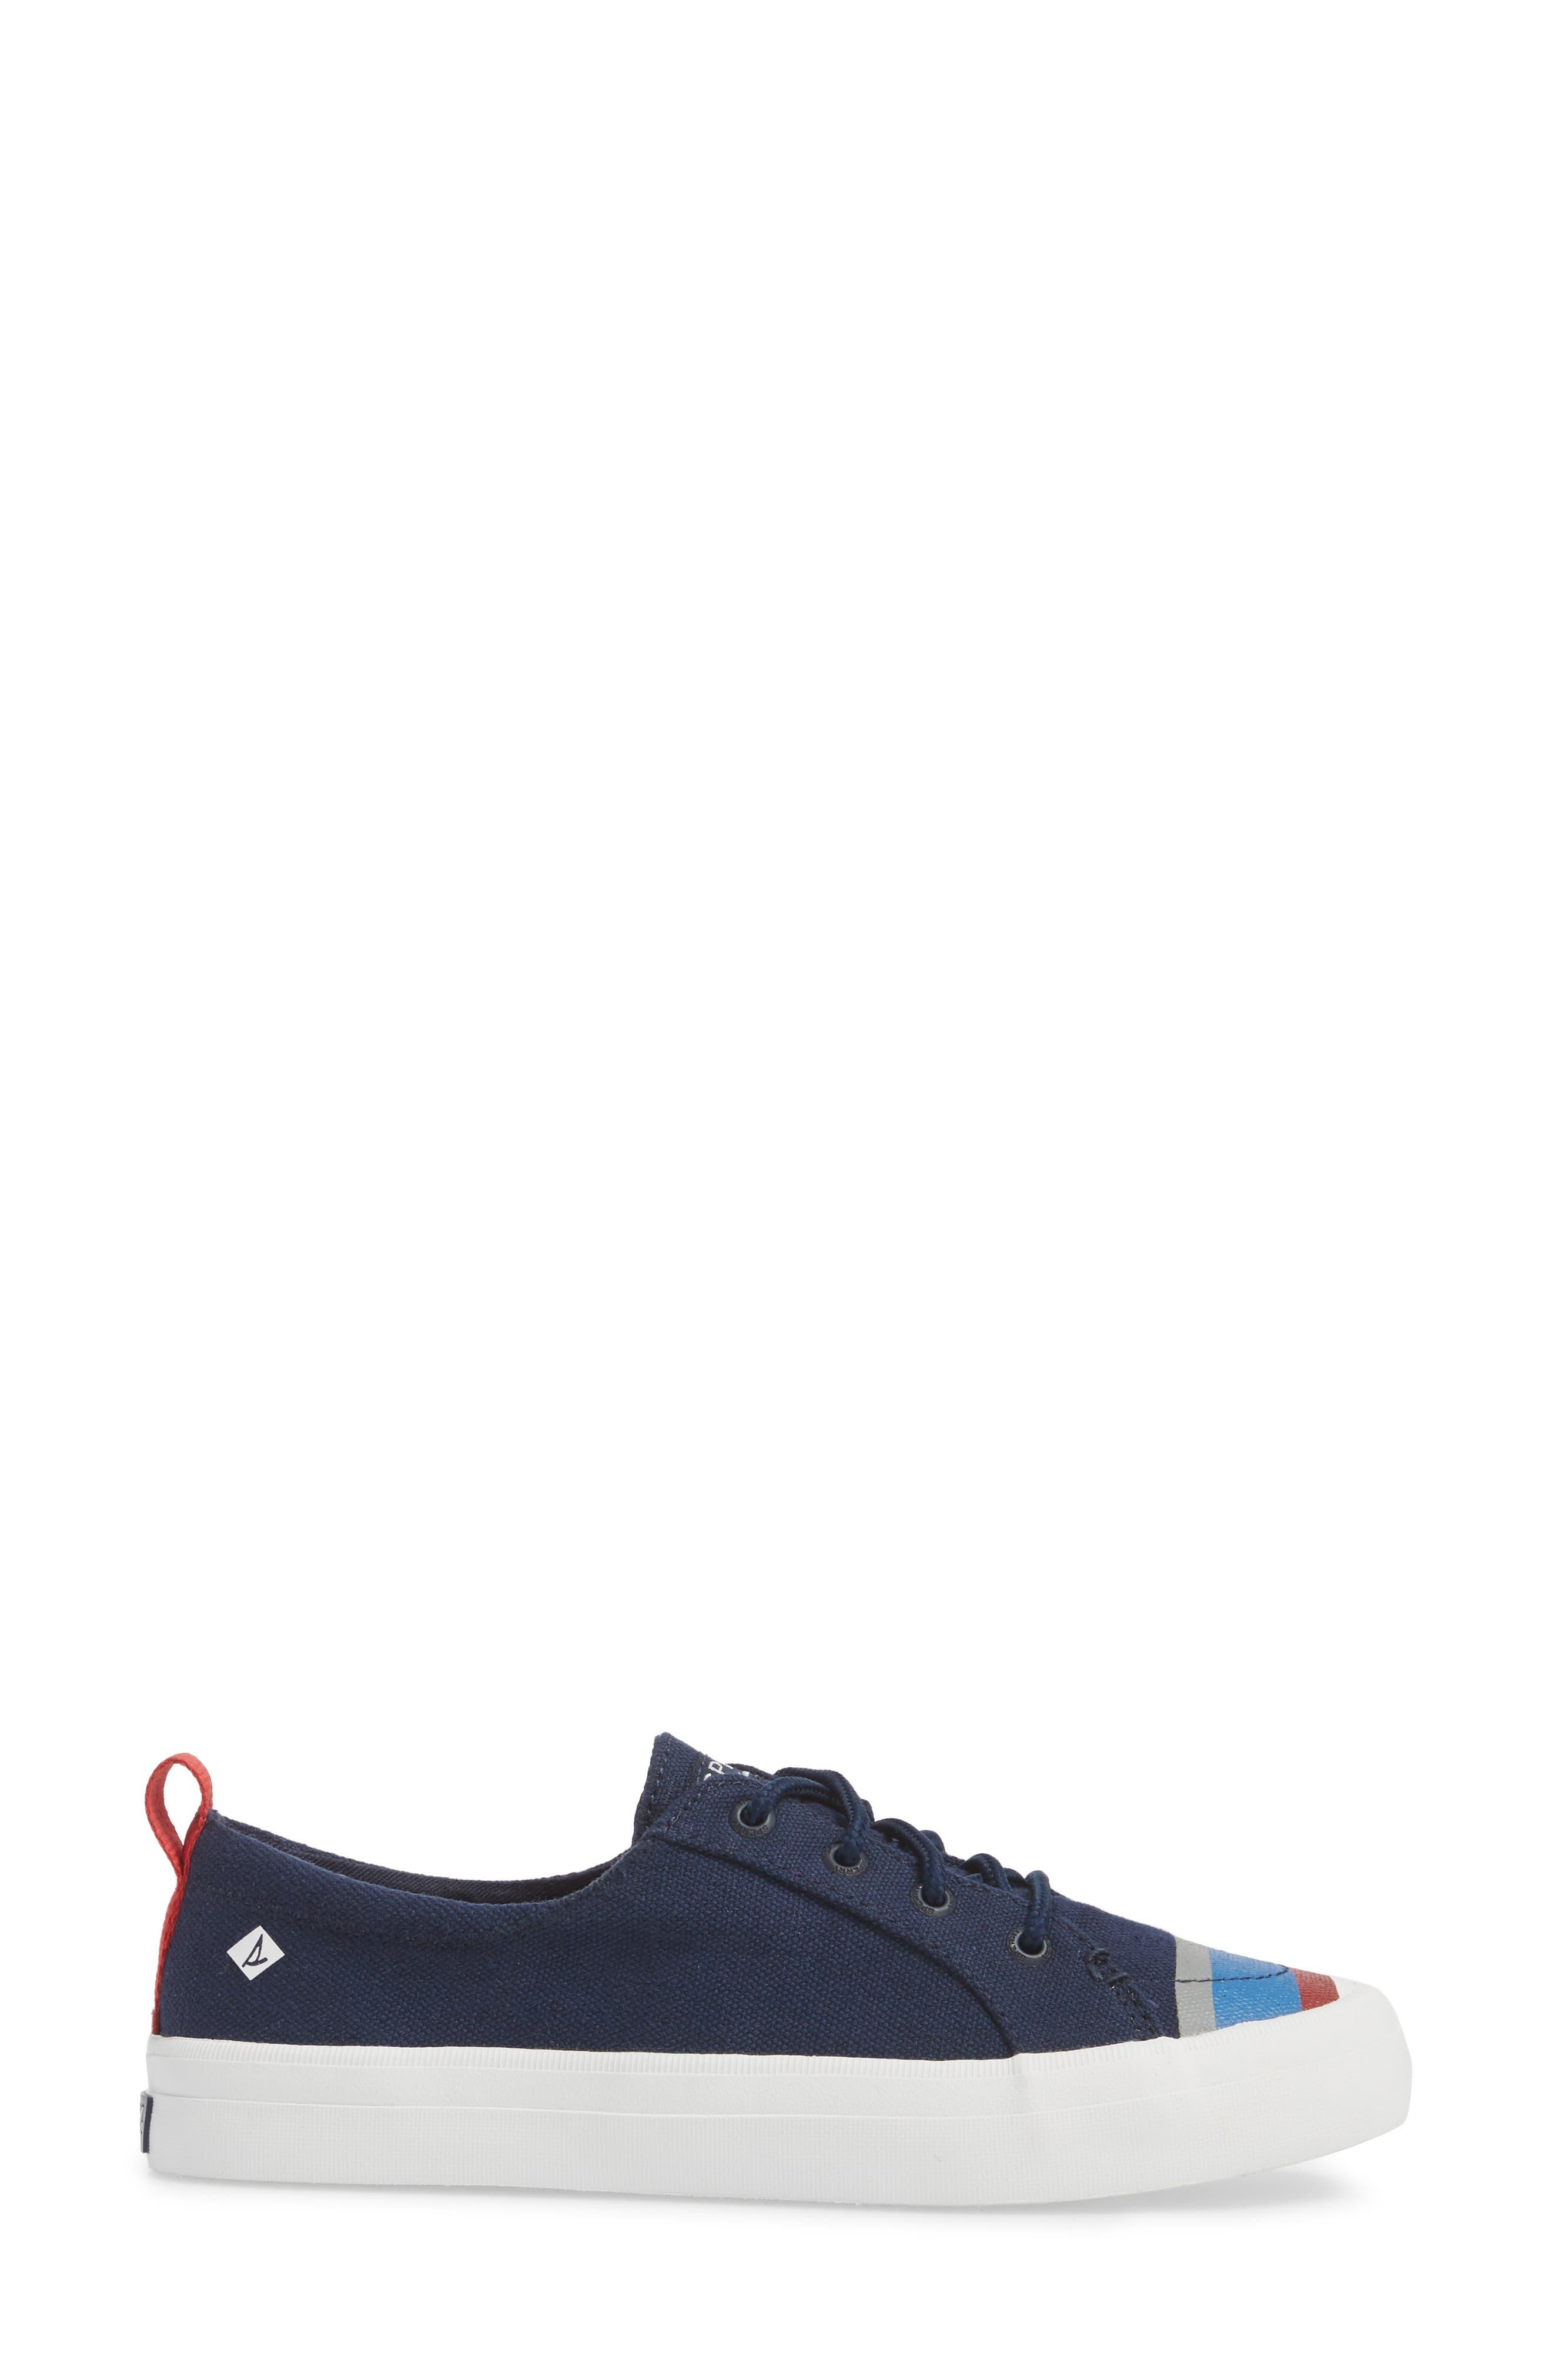 Crest Vibe Slip-On Sneaker,                             Alternate thumbnail 3, color,                             Navy Buoy Stripe Canvas